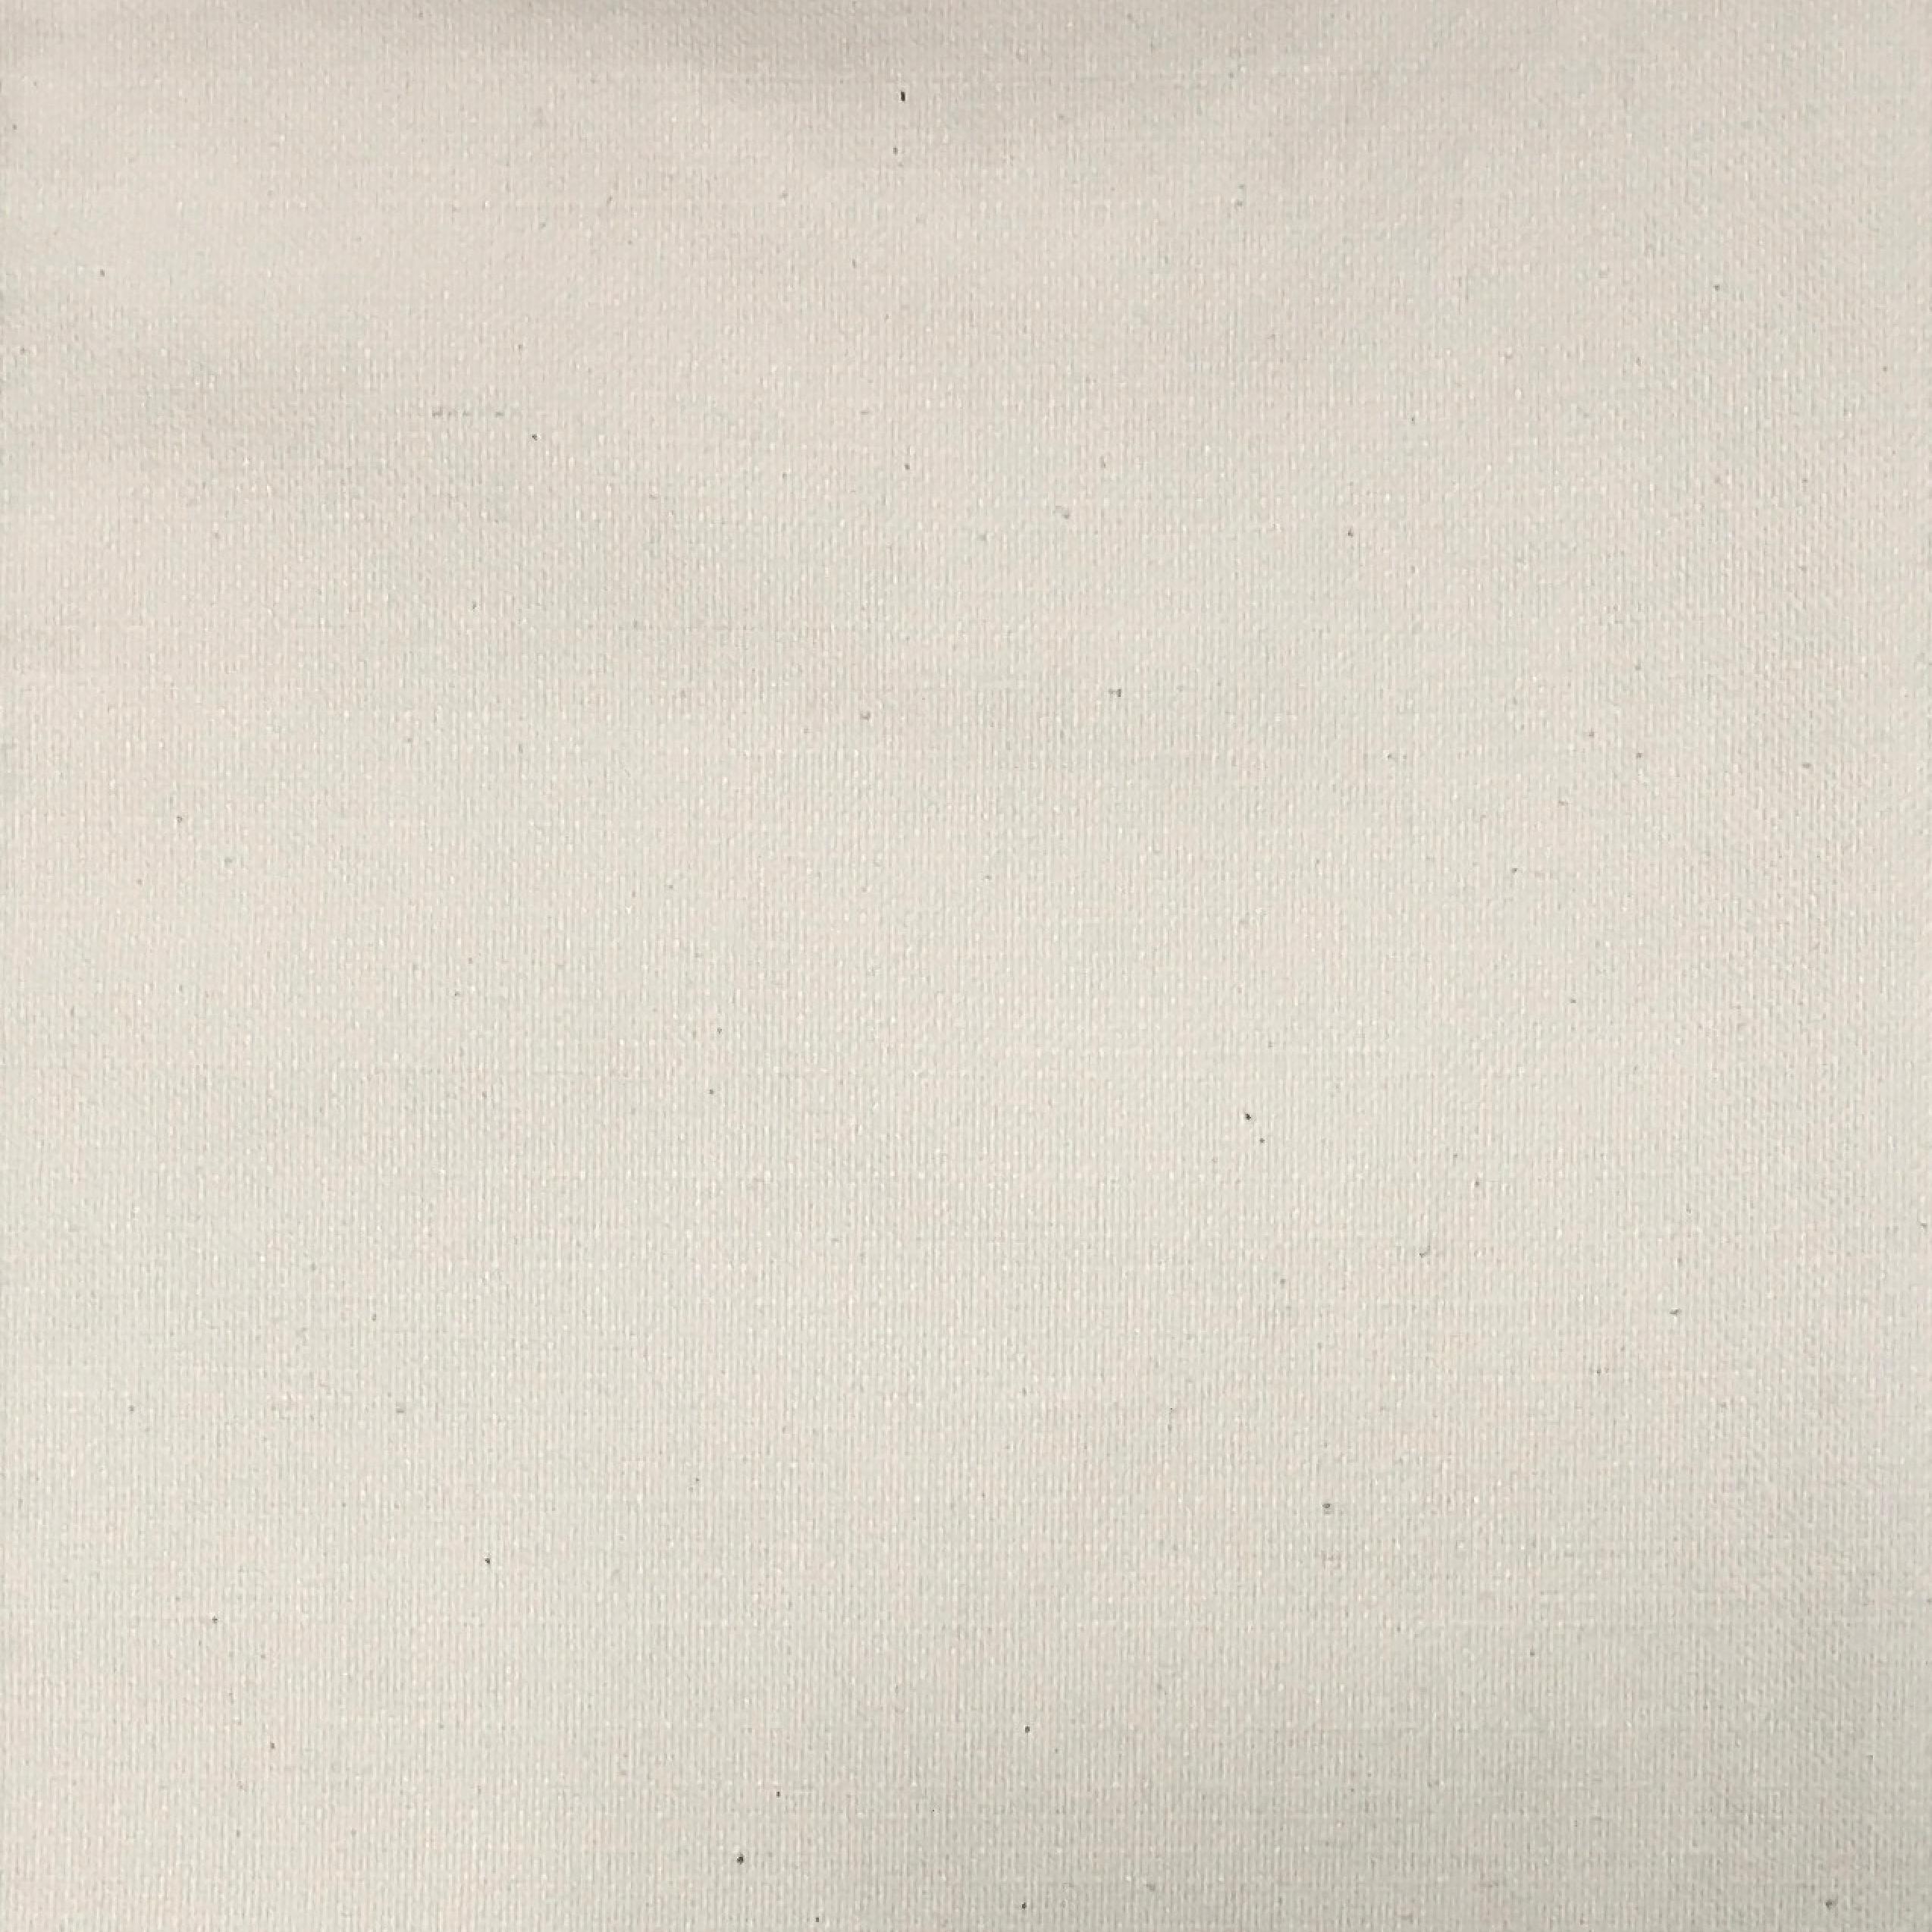 Slipcovered Furniture   United States   Nantuckit Furniture Company    Malden Milk Grade 3 (86% Cotton, 14% Polyester)